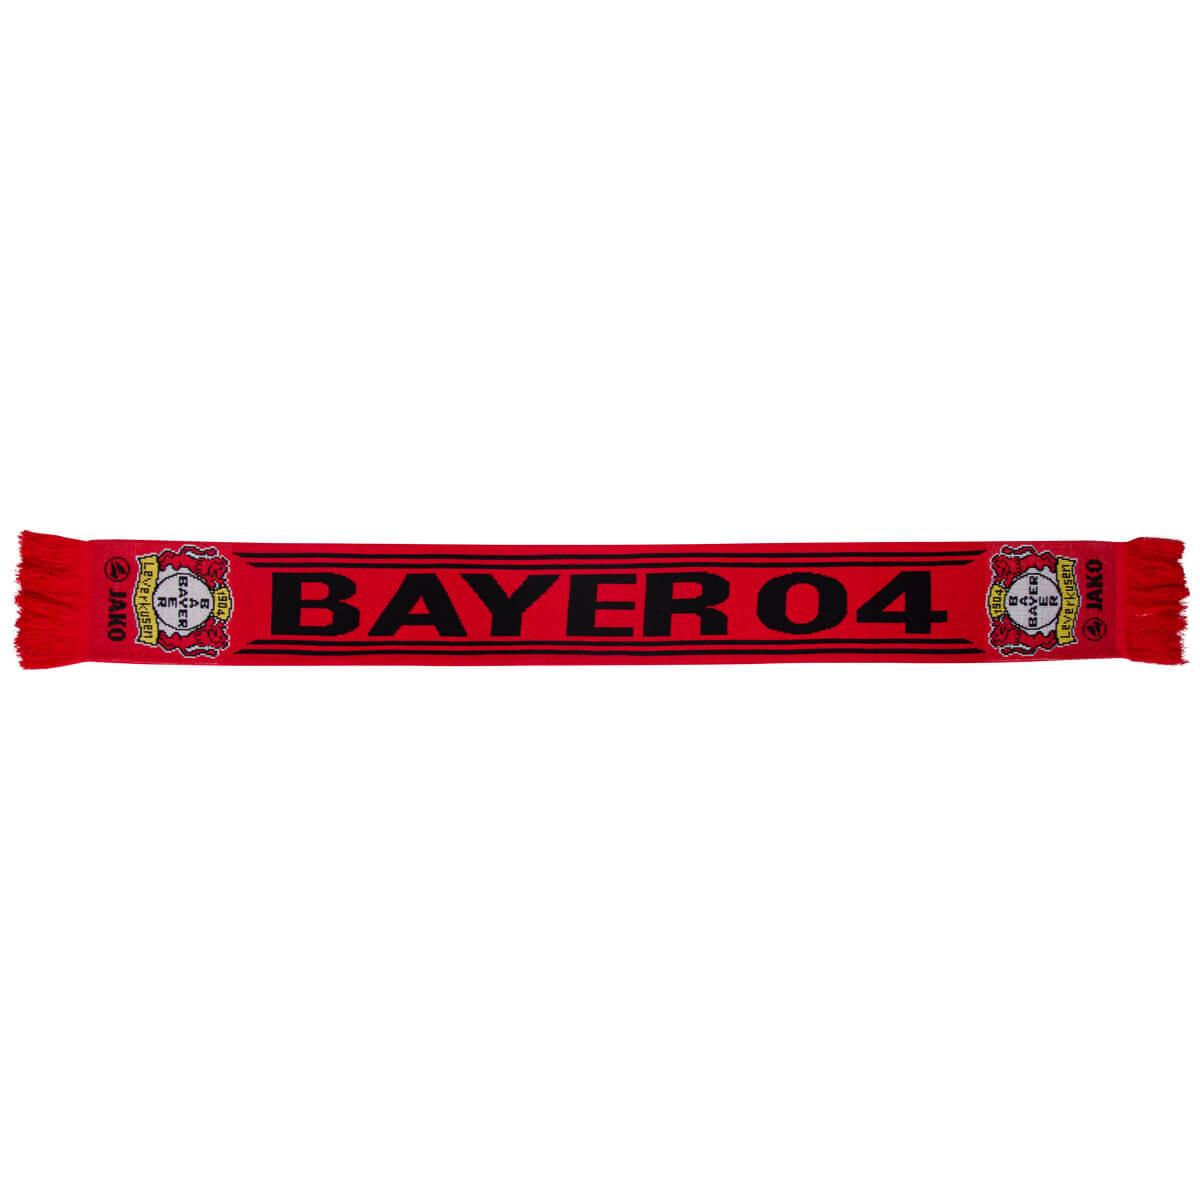 Jako Bayer 04 Leverkusen Fan-Schal  BA1205  | div. Größen / Farben